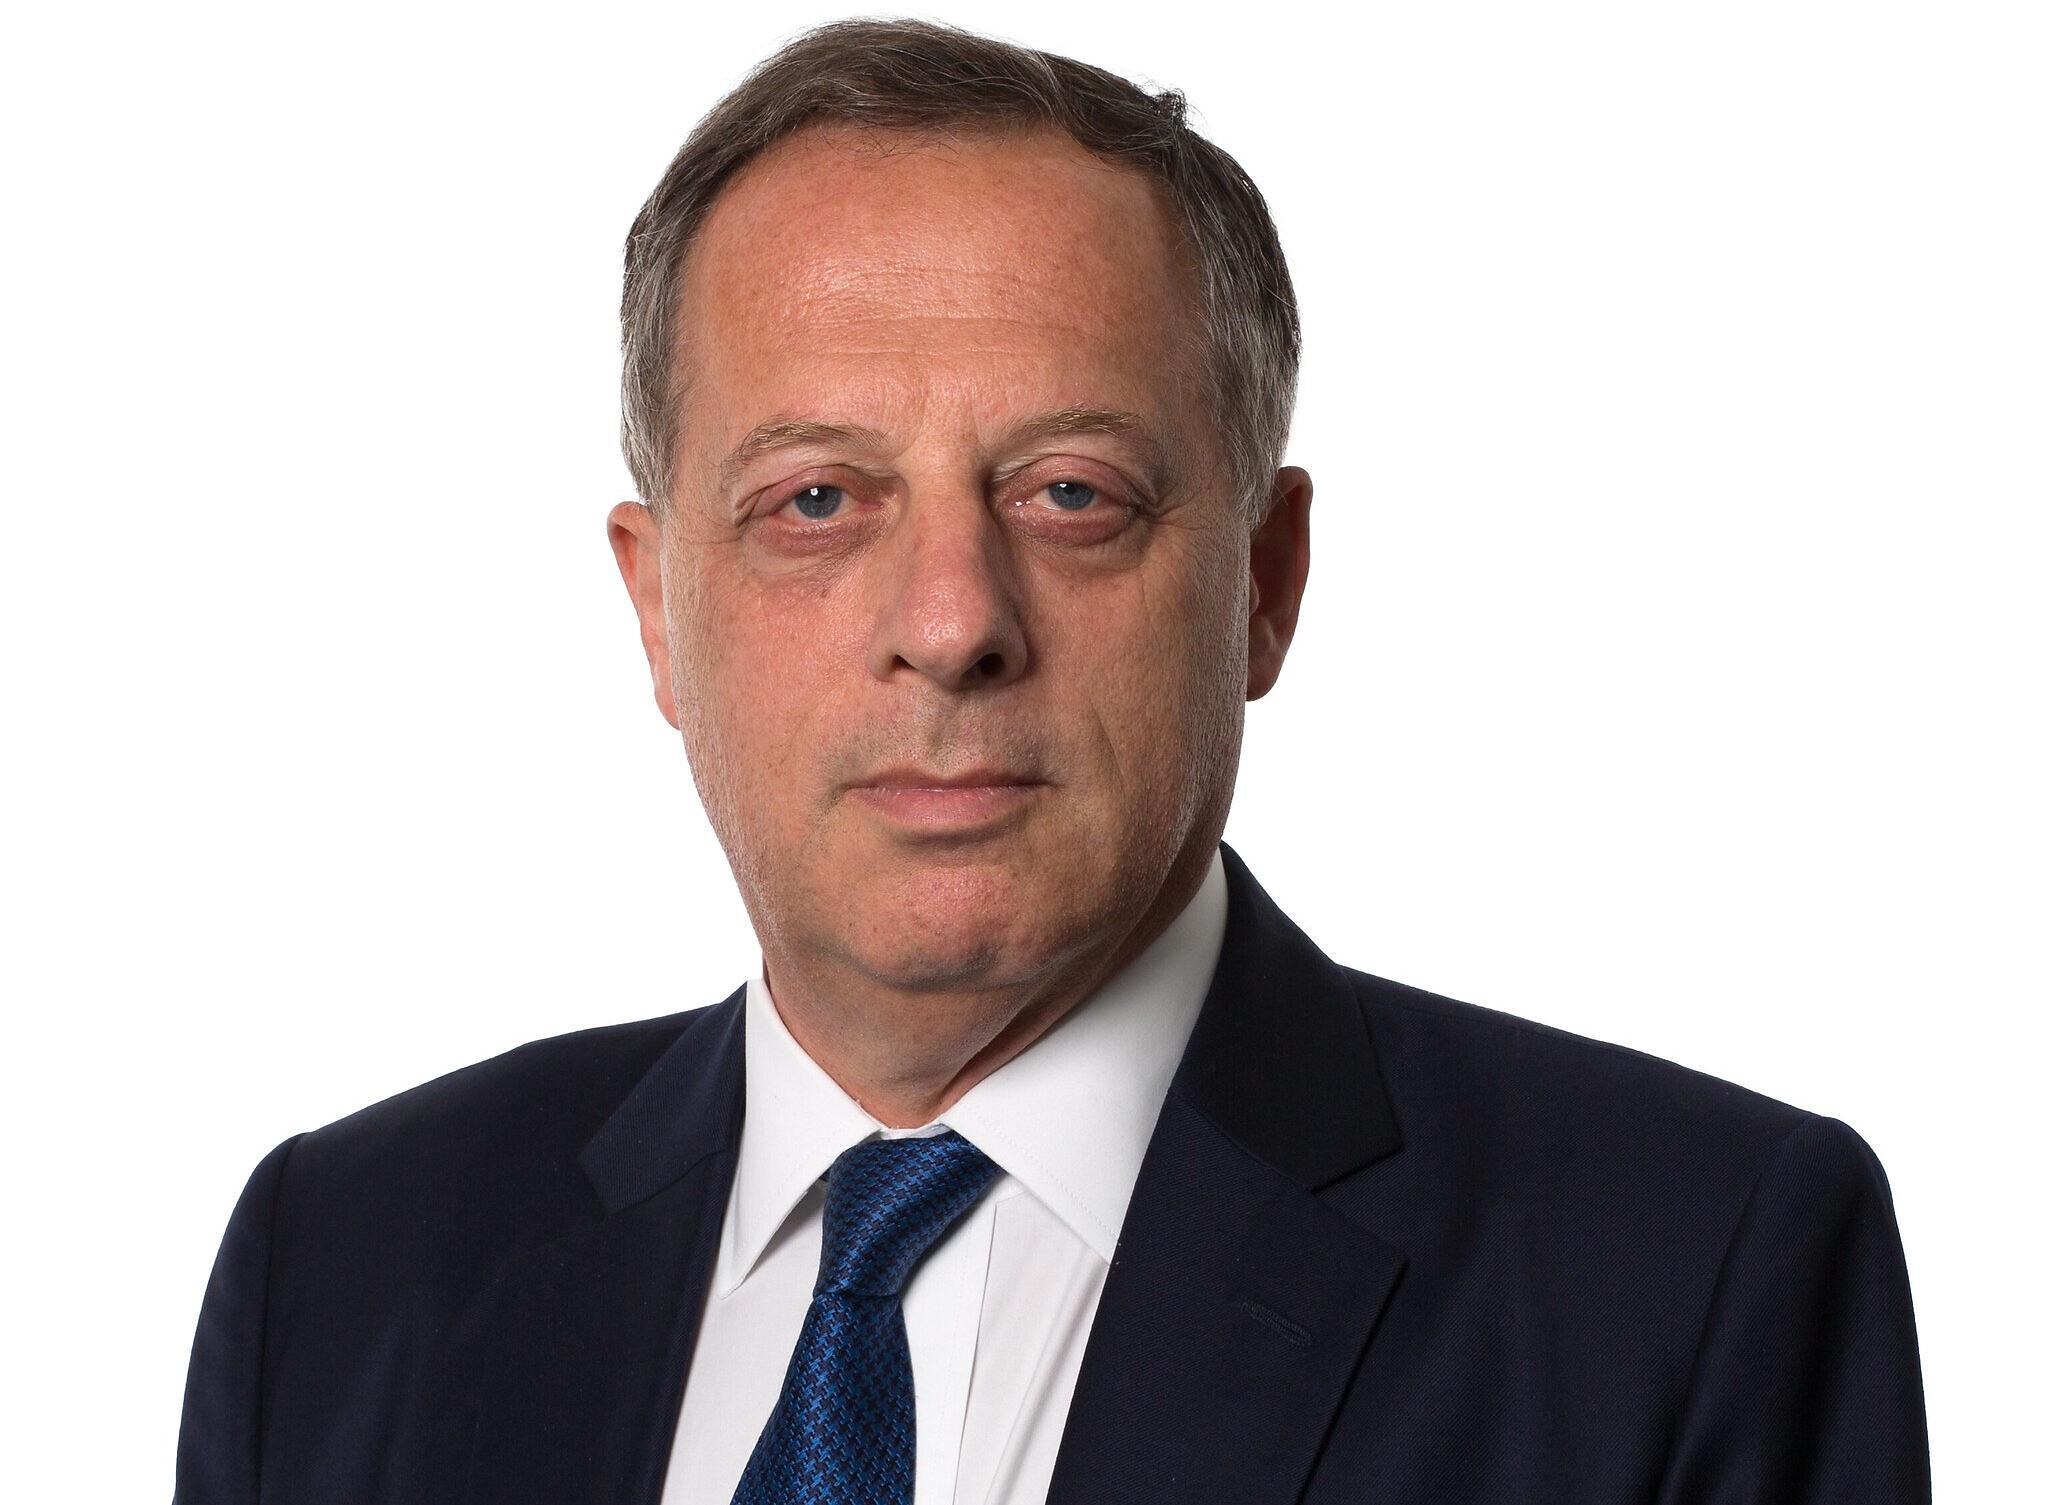 Ex-Goldman banker Richard Sharp to be next BBC chairman